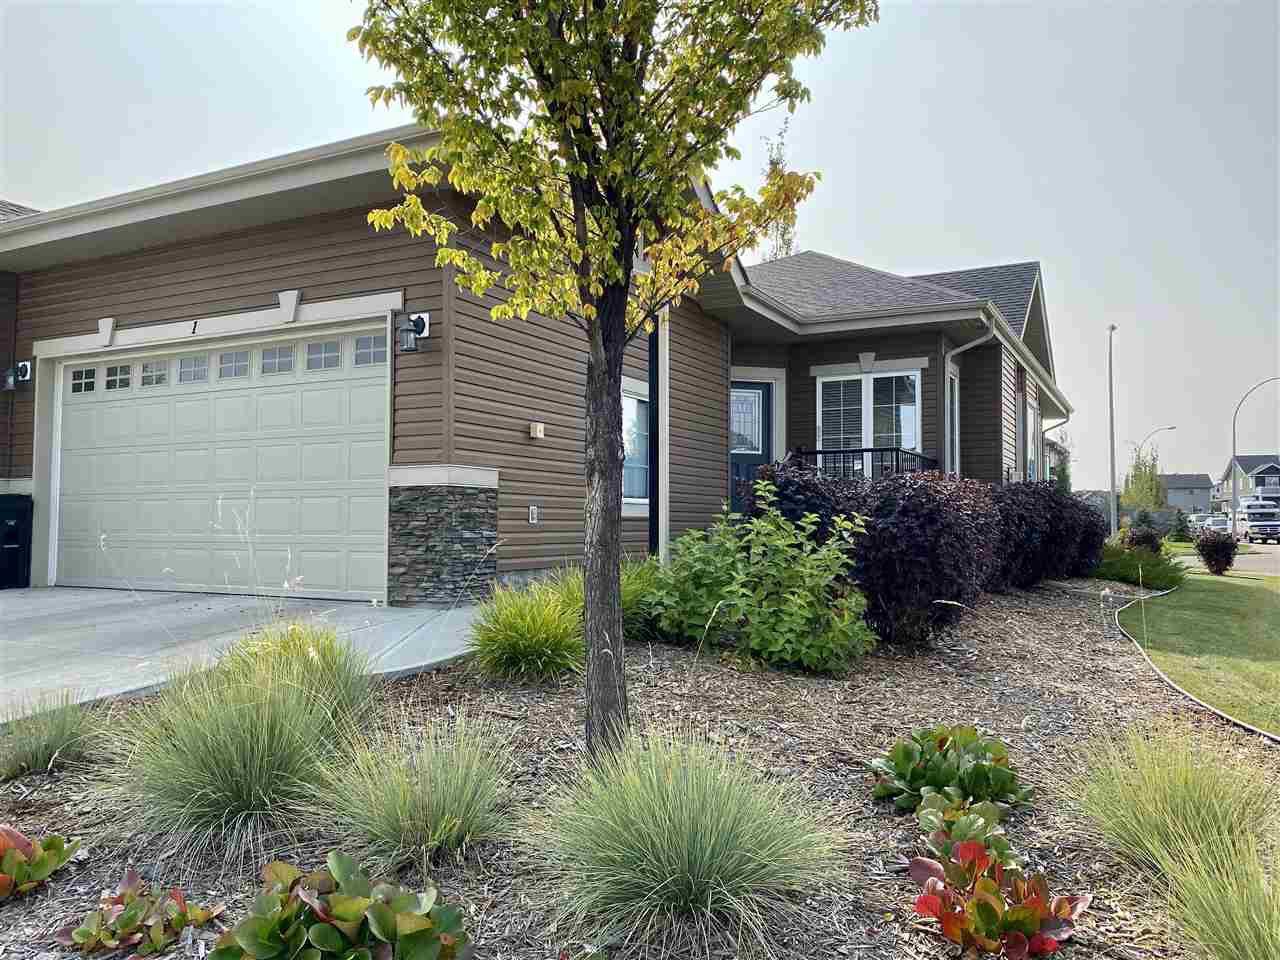 Main Photo: 1 4001 ETON Boulevard: Sherwood Park House Half Duplex for sale : MLS®# E4215412